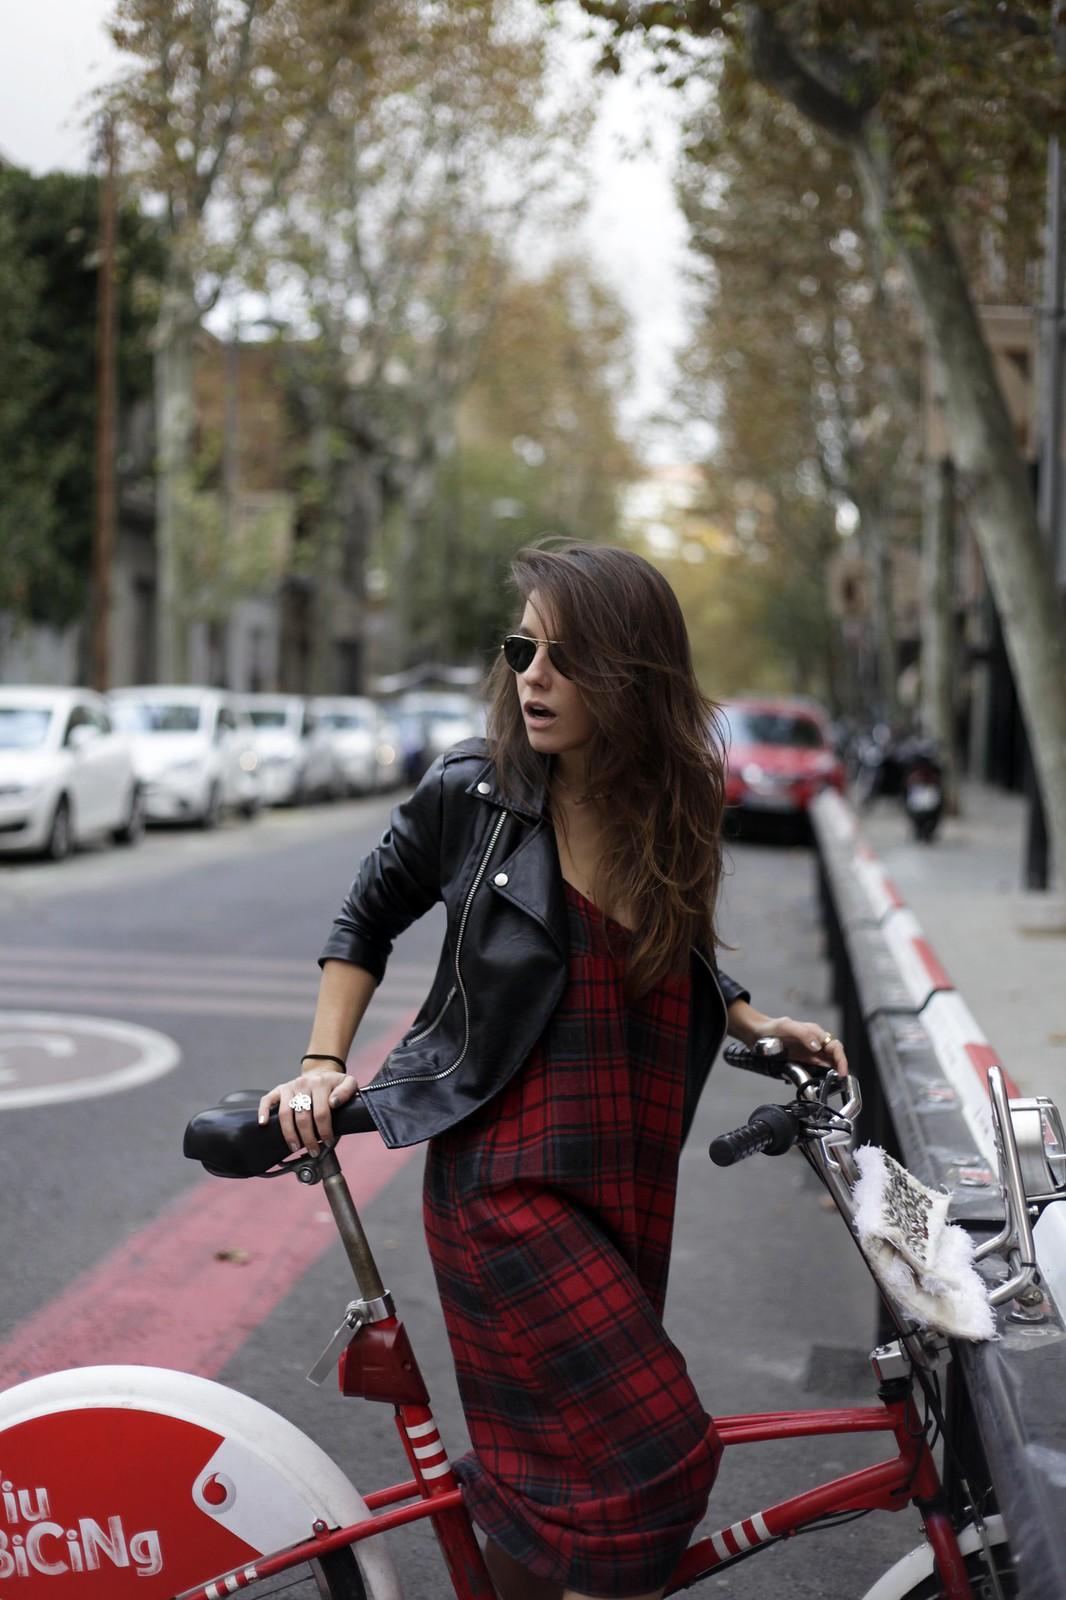 016_vestido_lencero_cuadros_zara_influencer_theguestgirl_barcelona